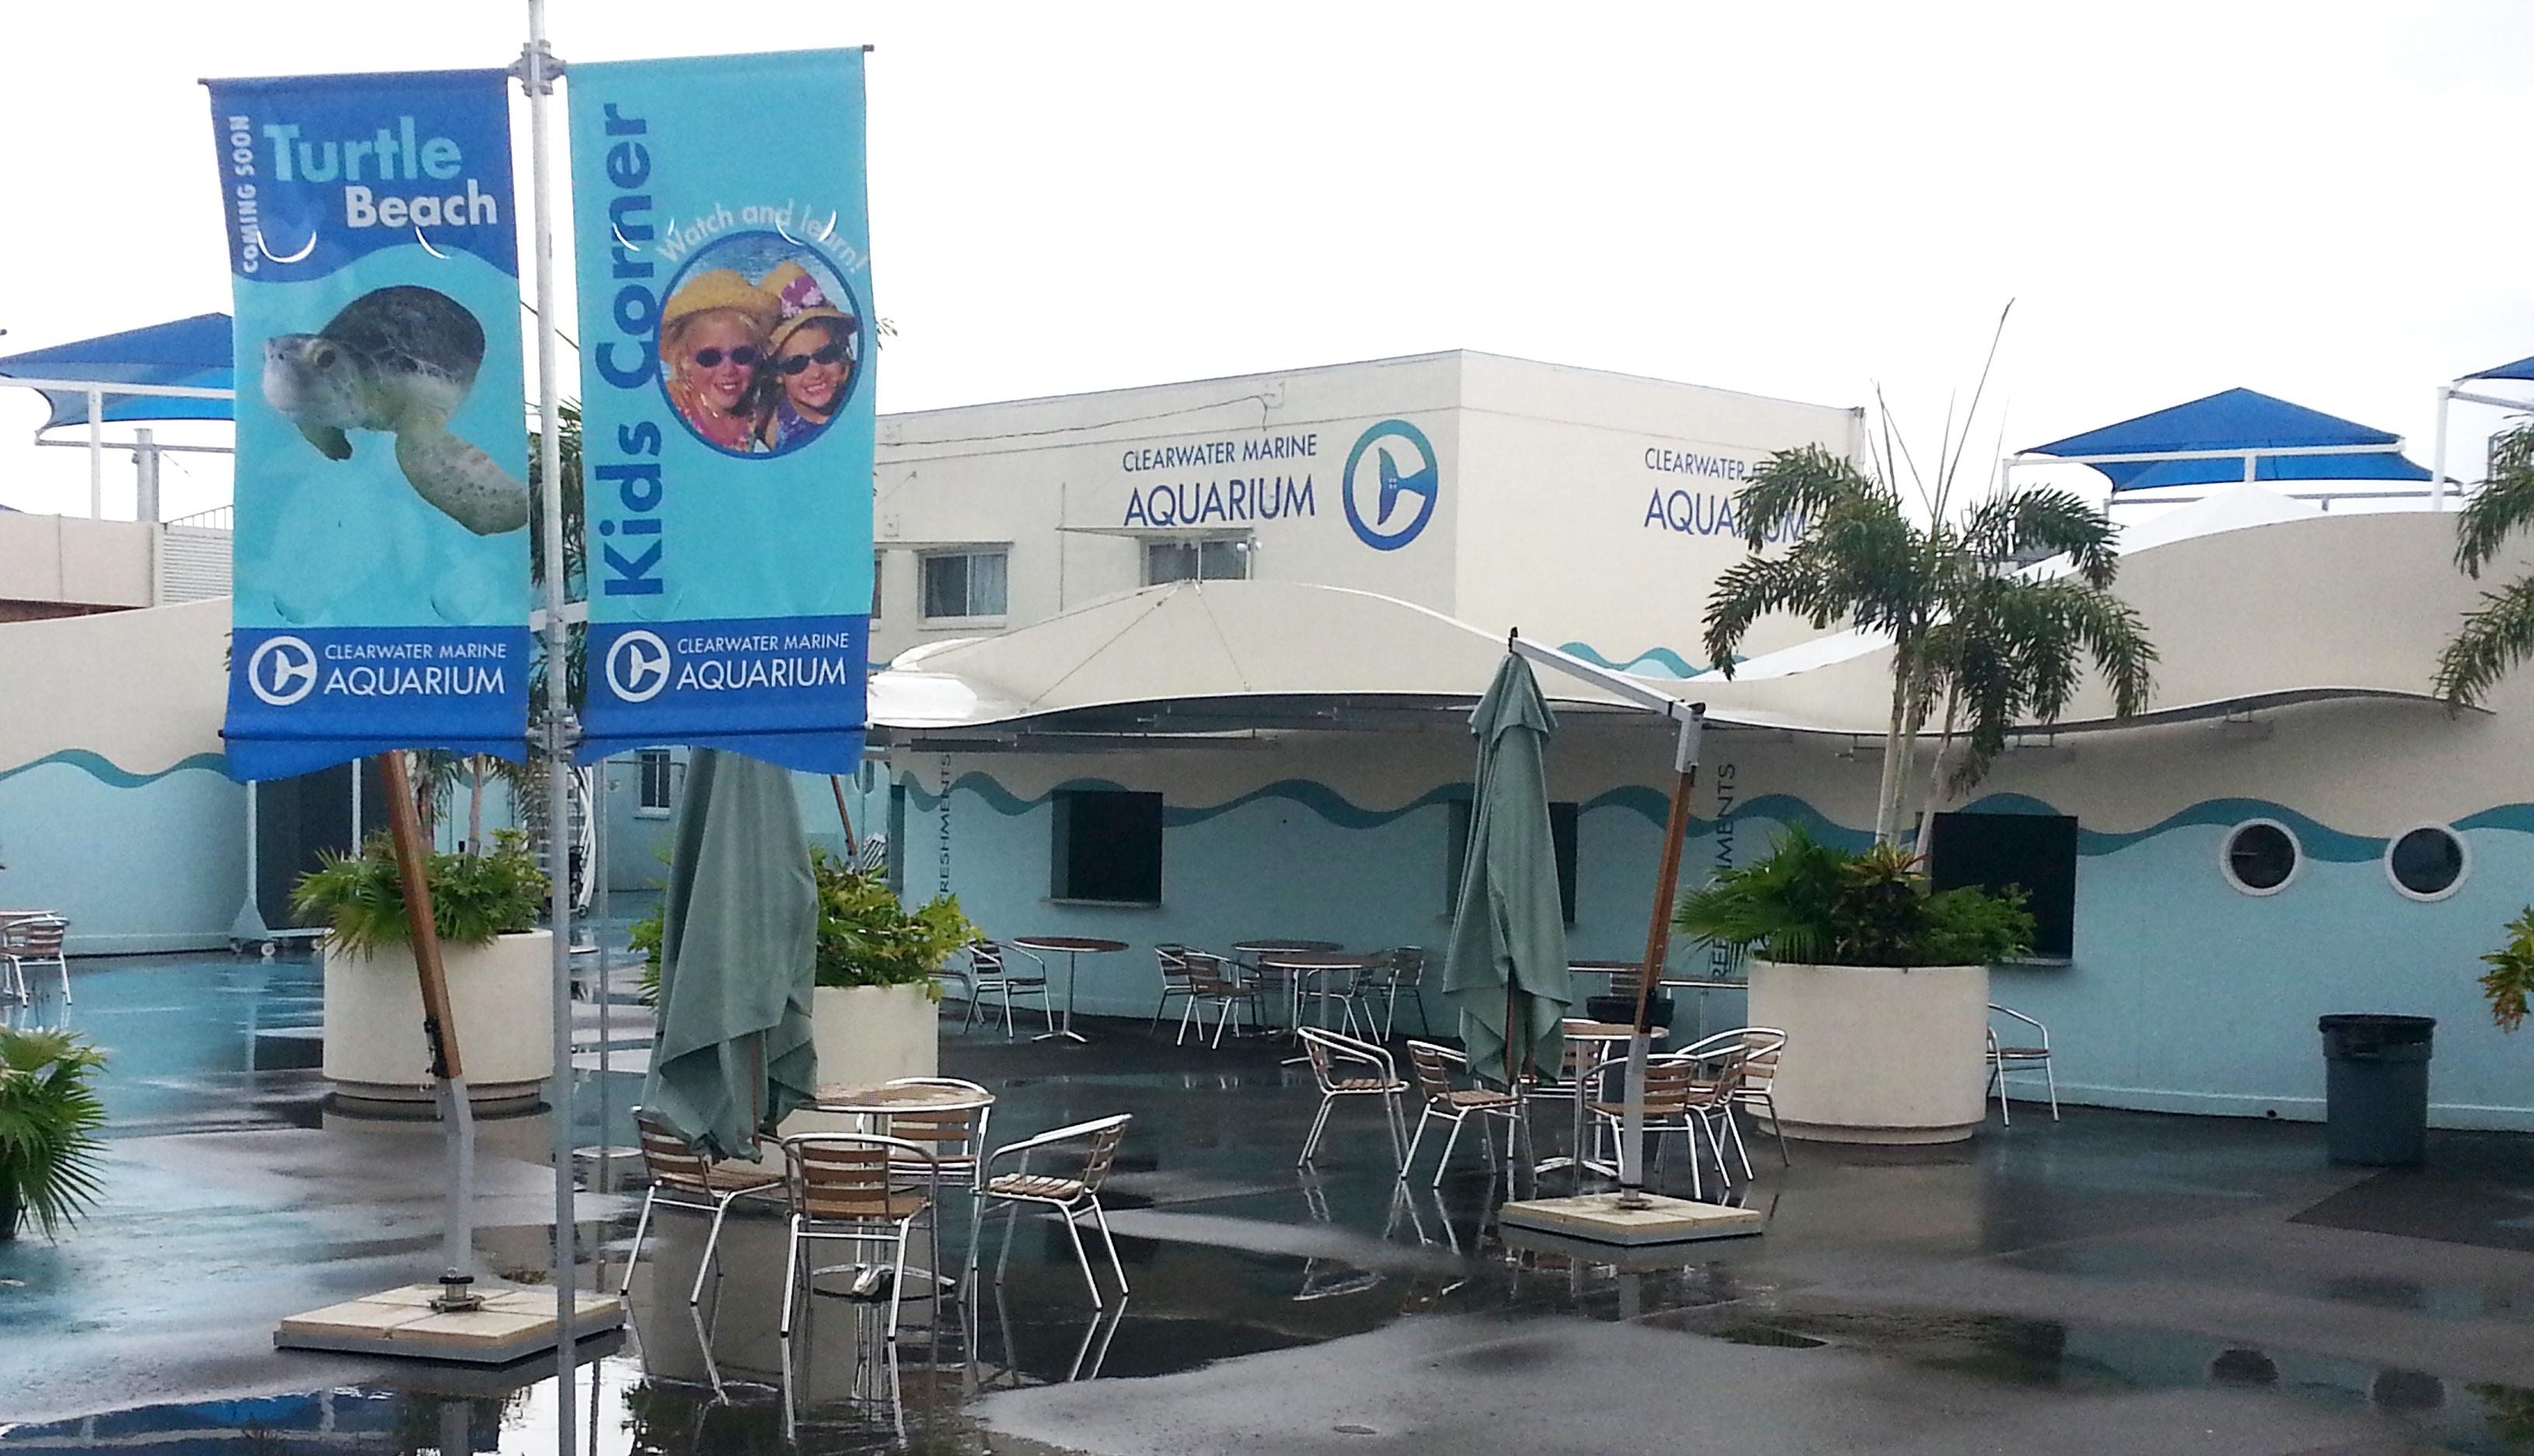 Clearwater Marine Aquarium Cma Floridaography